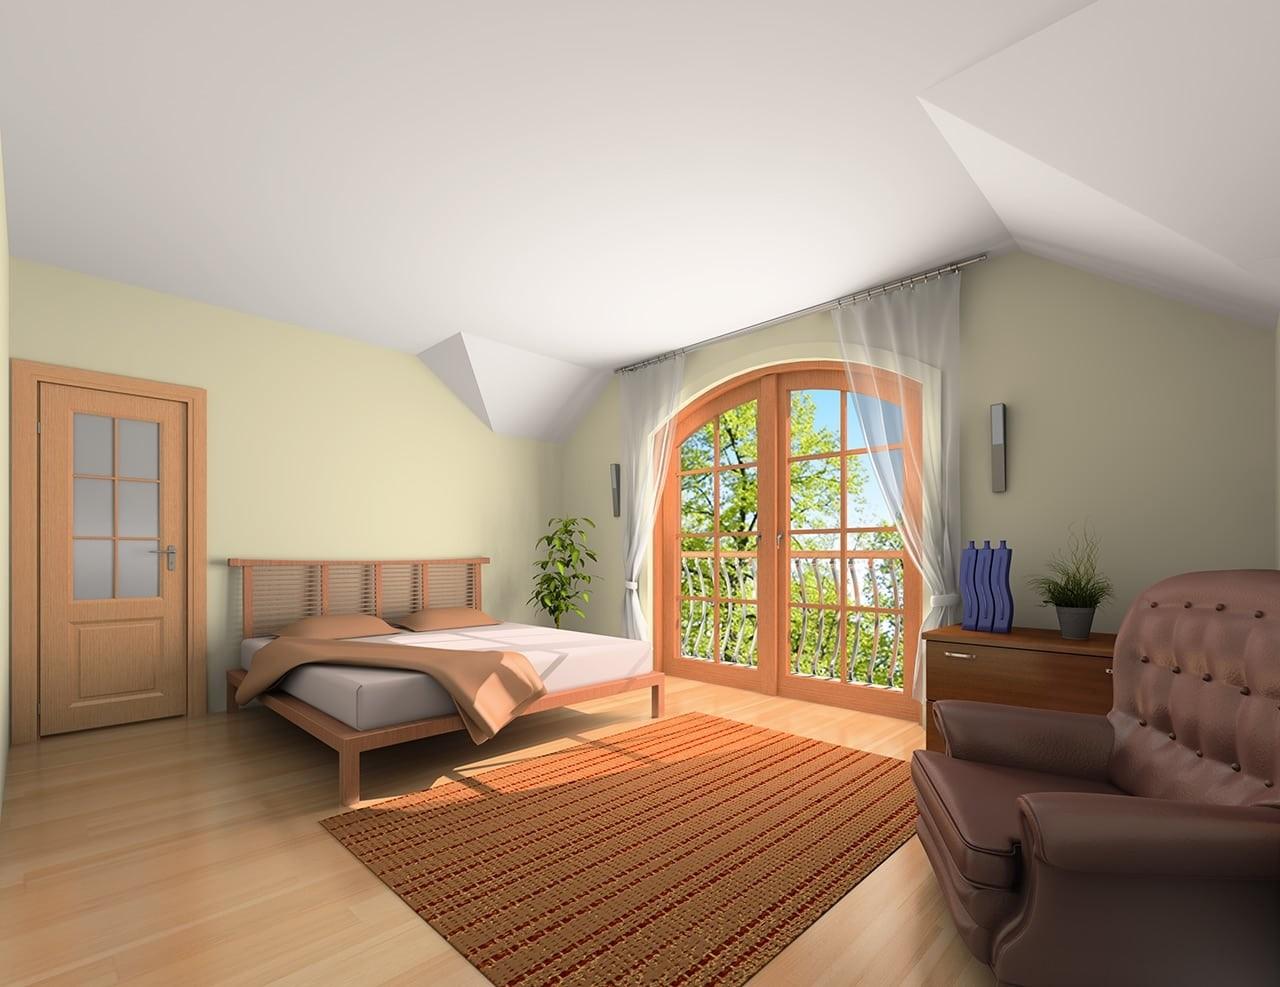 Projekt domu Benedykt 5 odbicie lustrzane